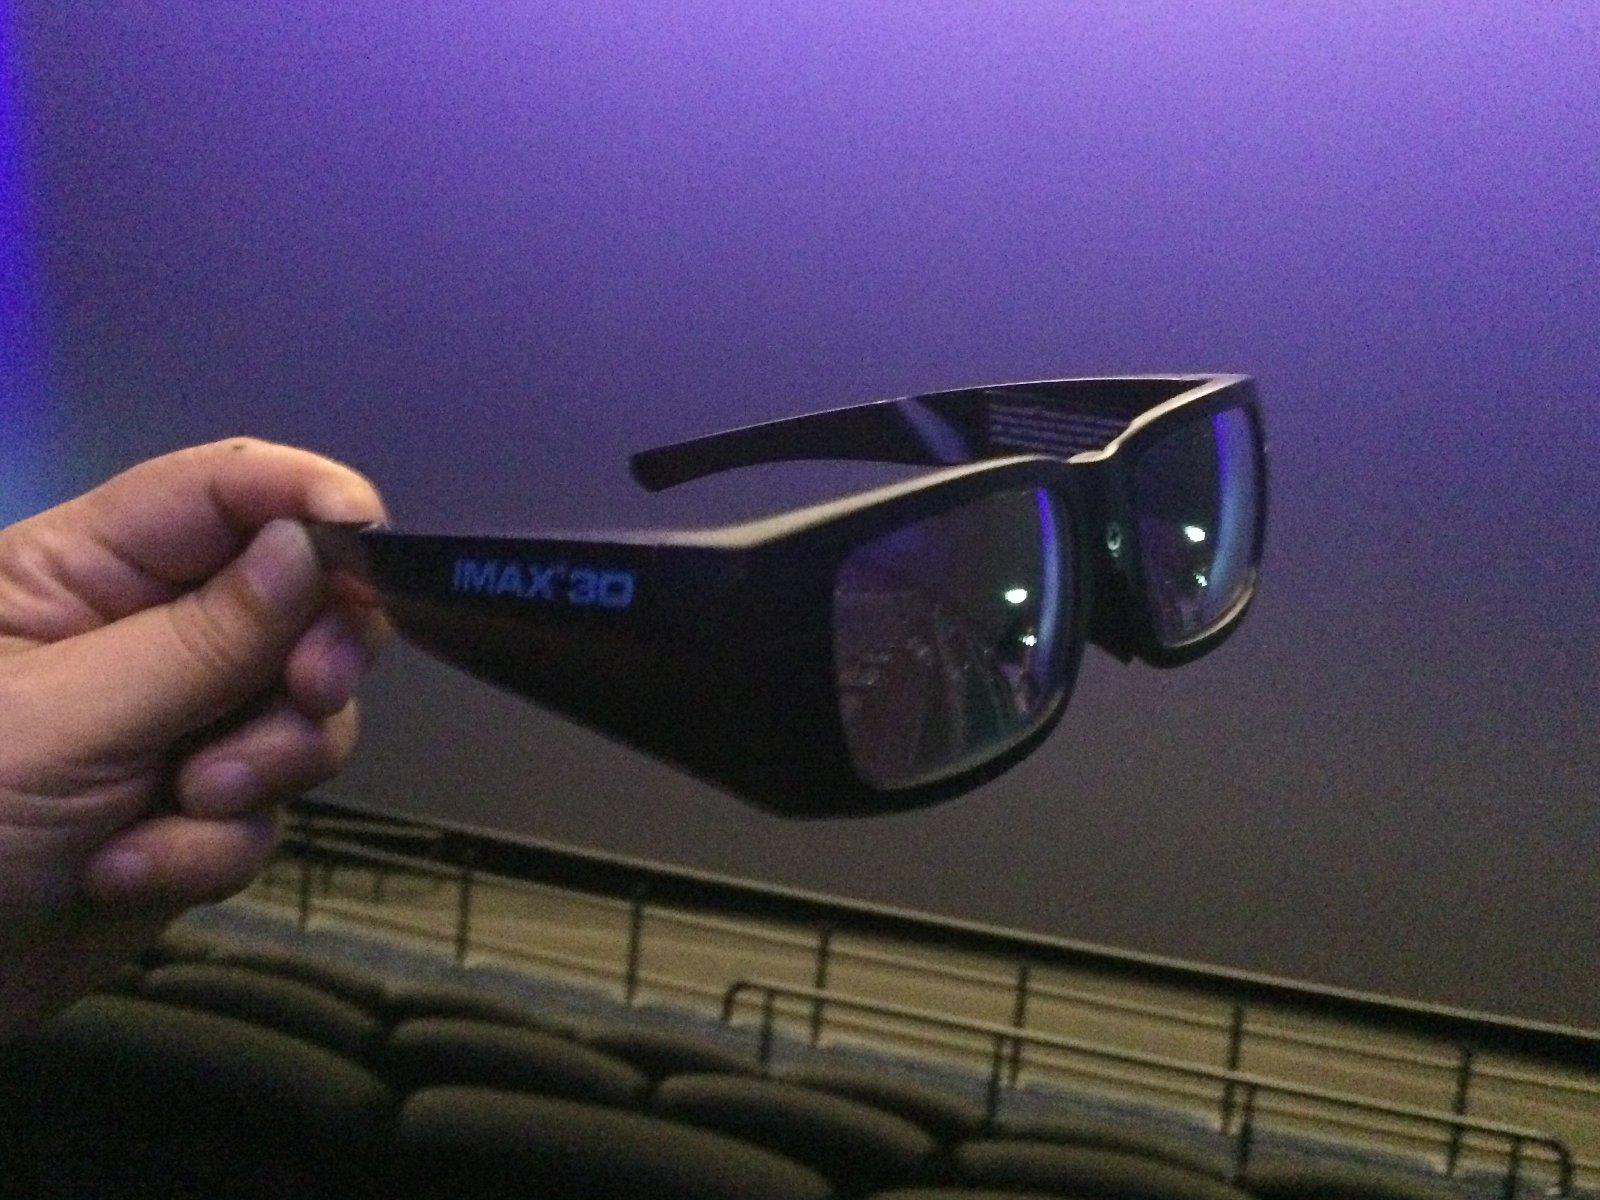 20180511 IMAX専用3Dメガネ